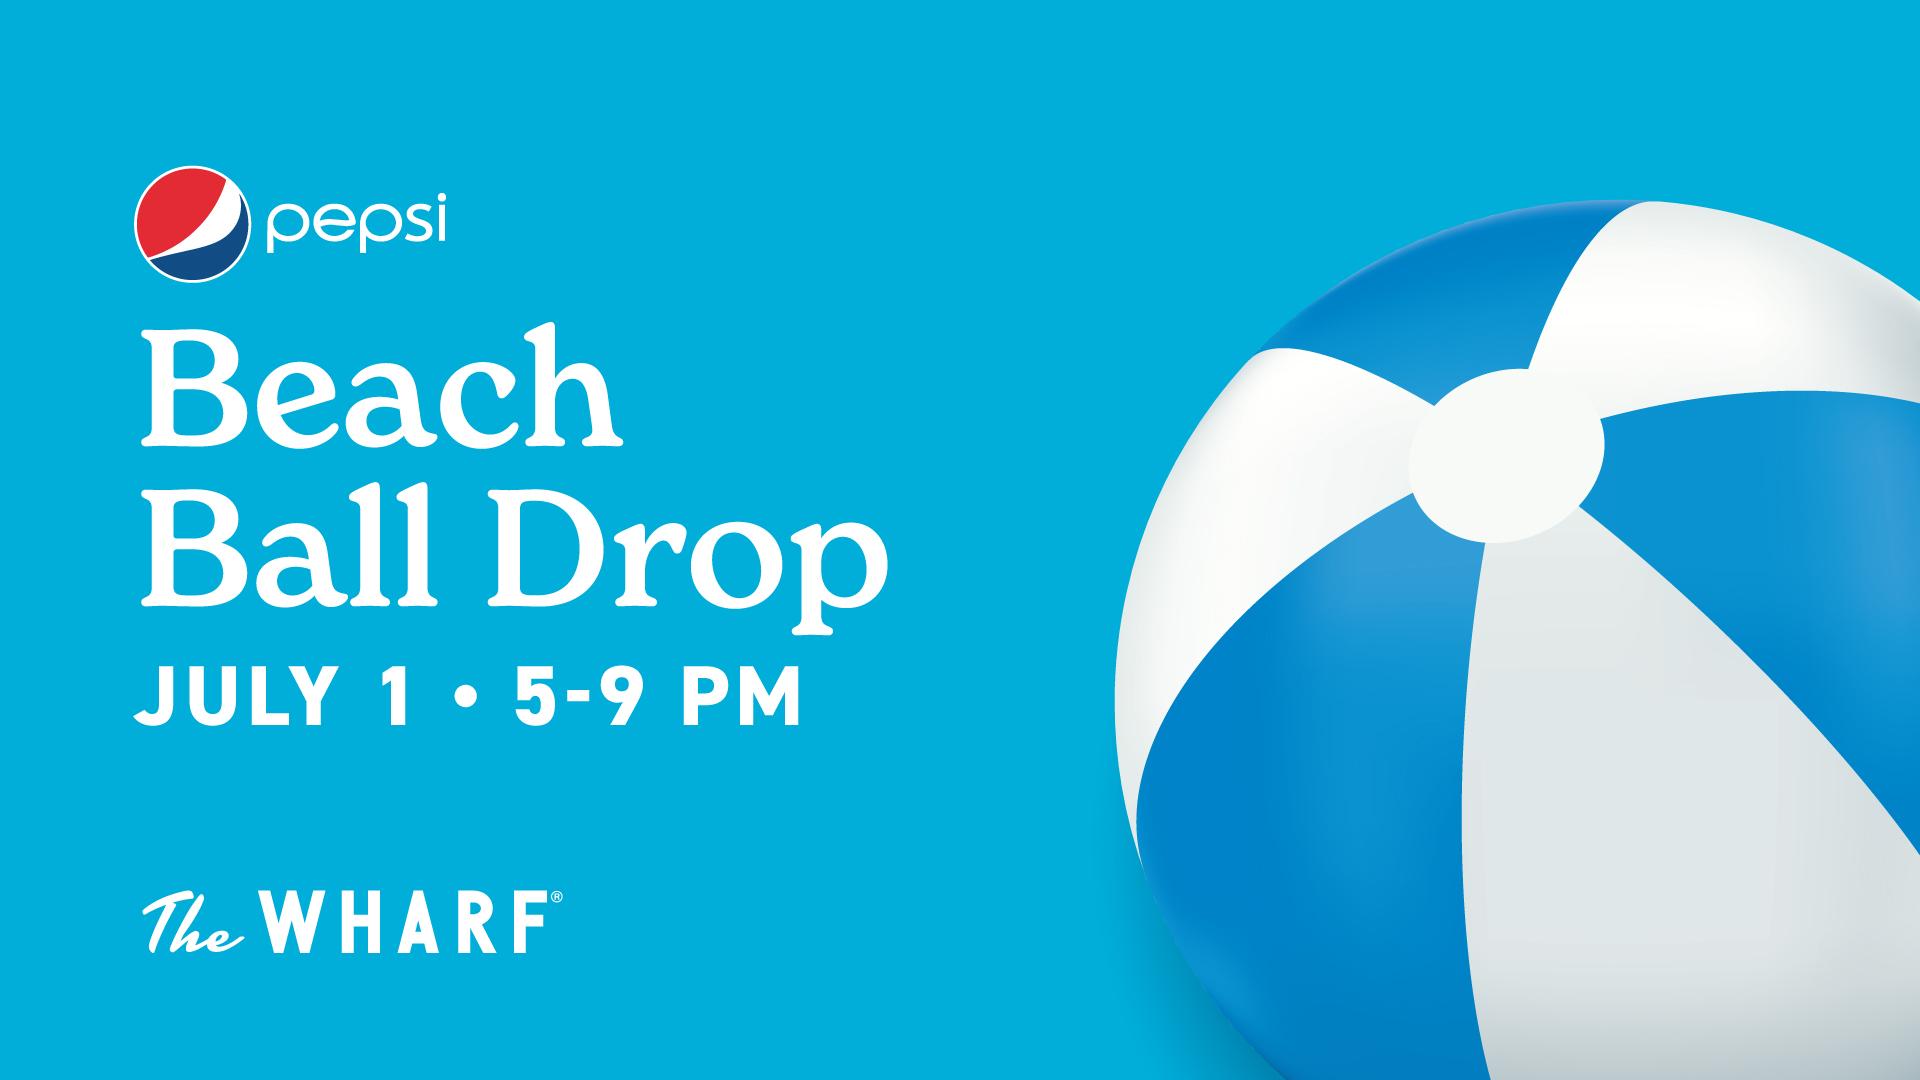 Pepsi Beach Ball Drop